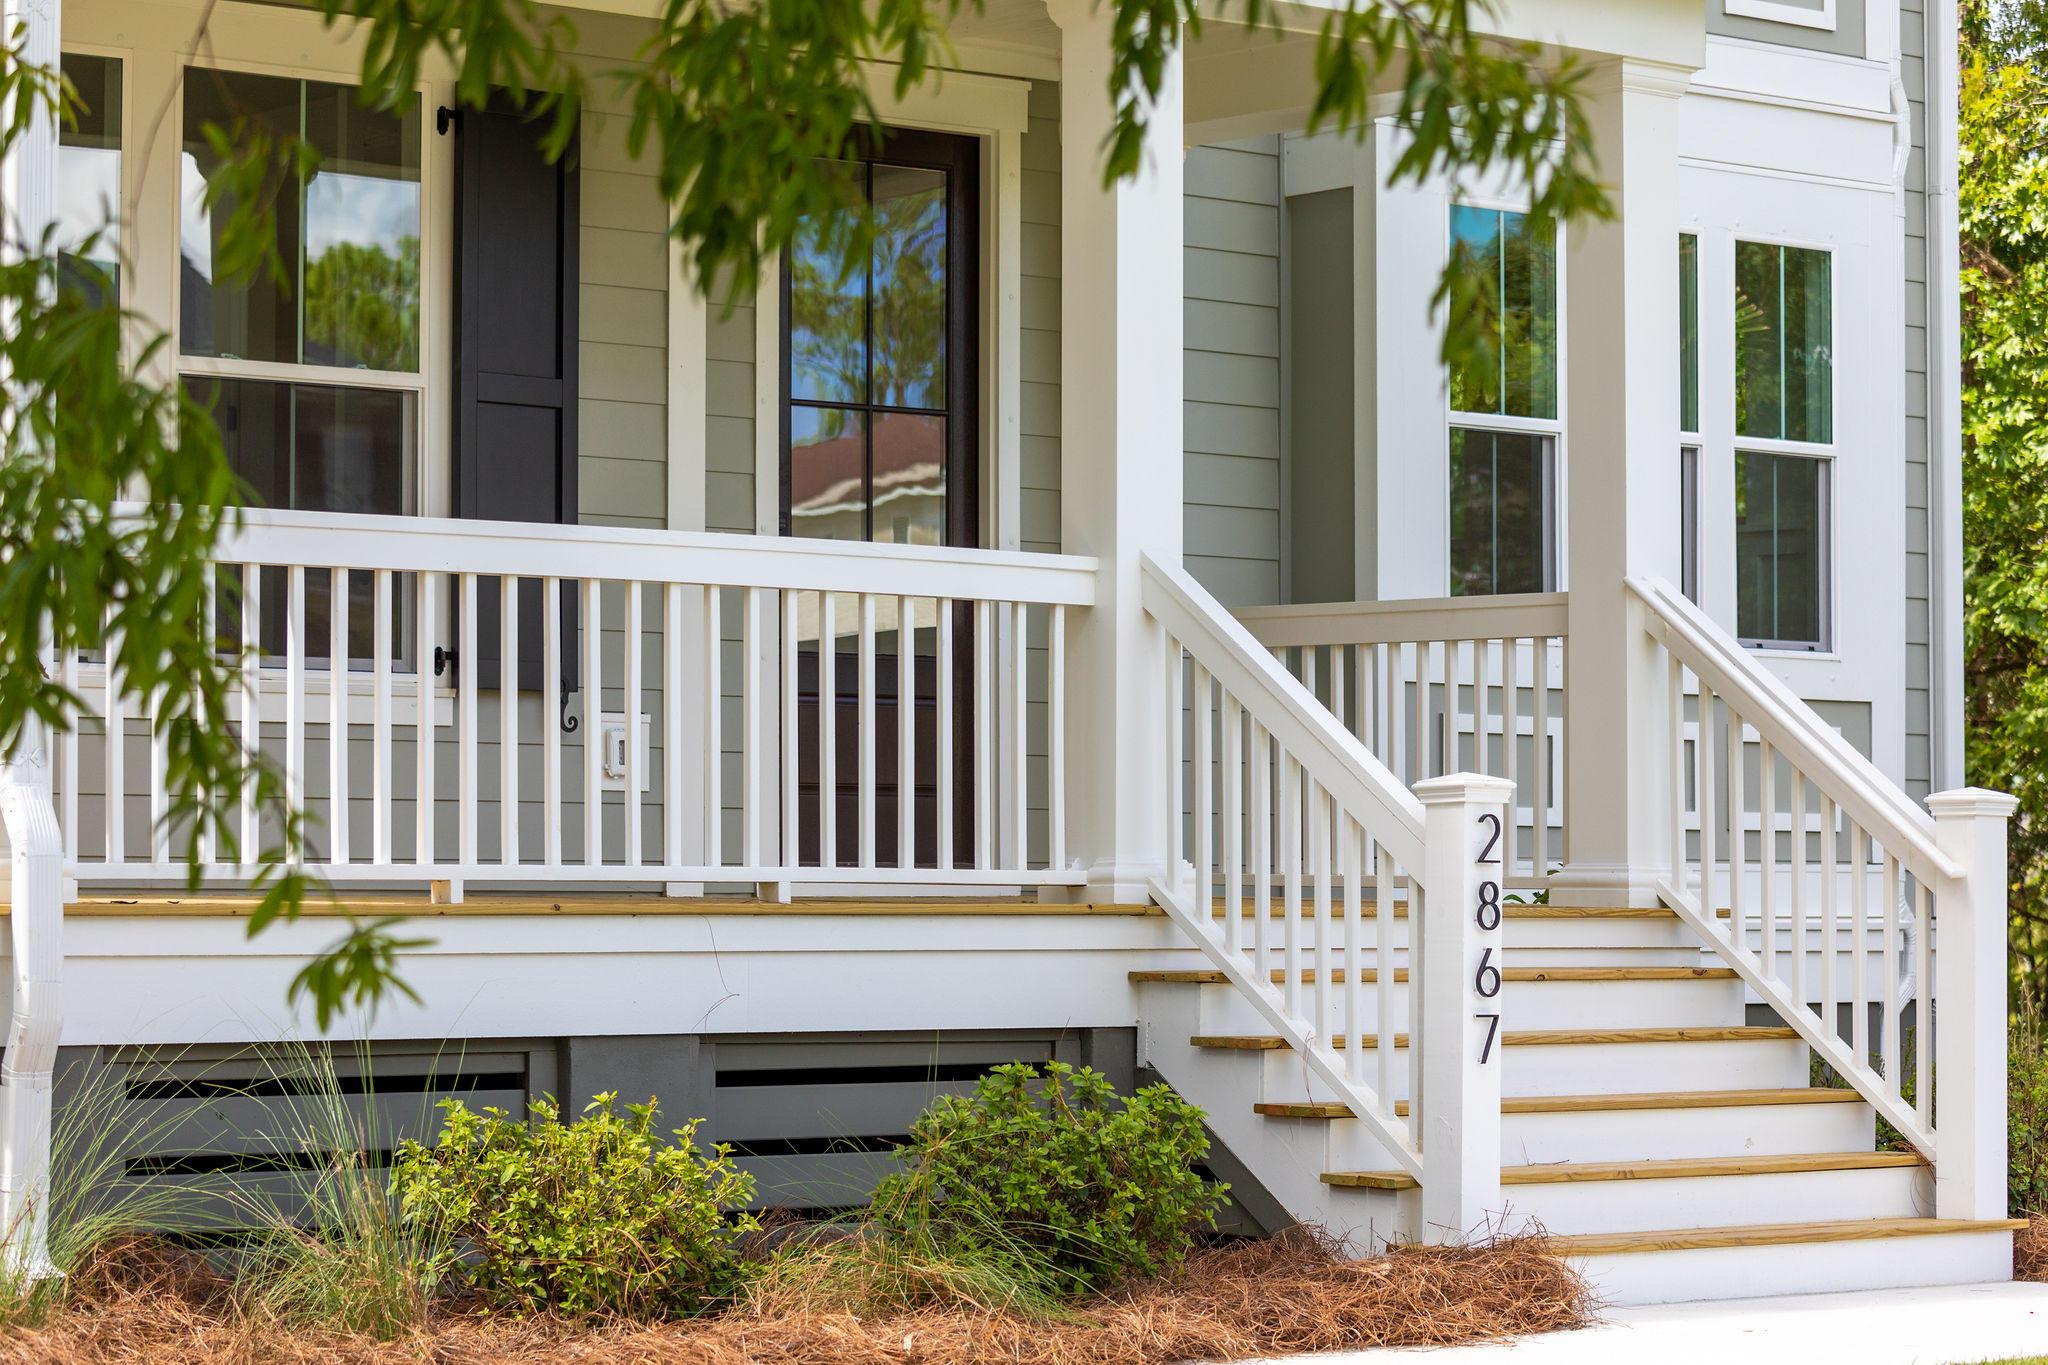 Park West Homes For Sale - 2291 Middlesex, Mount Pleasant, SC - 46